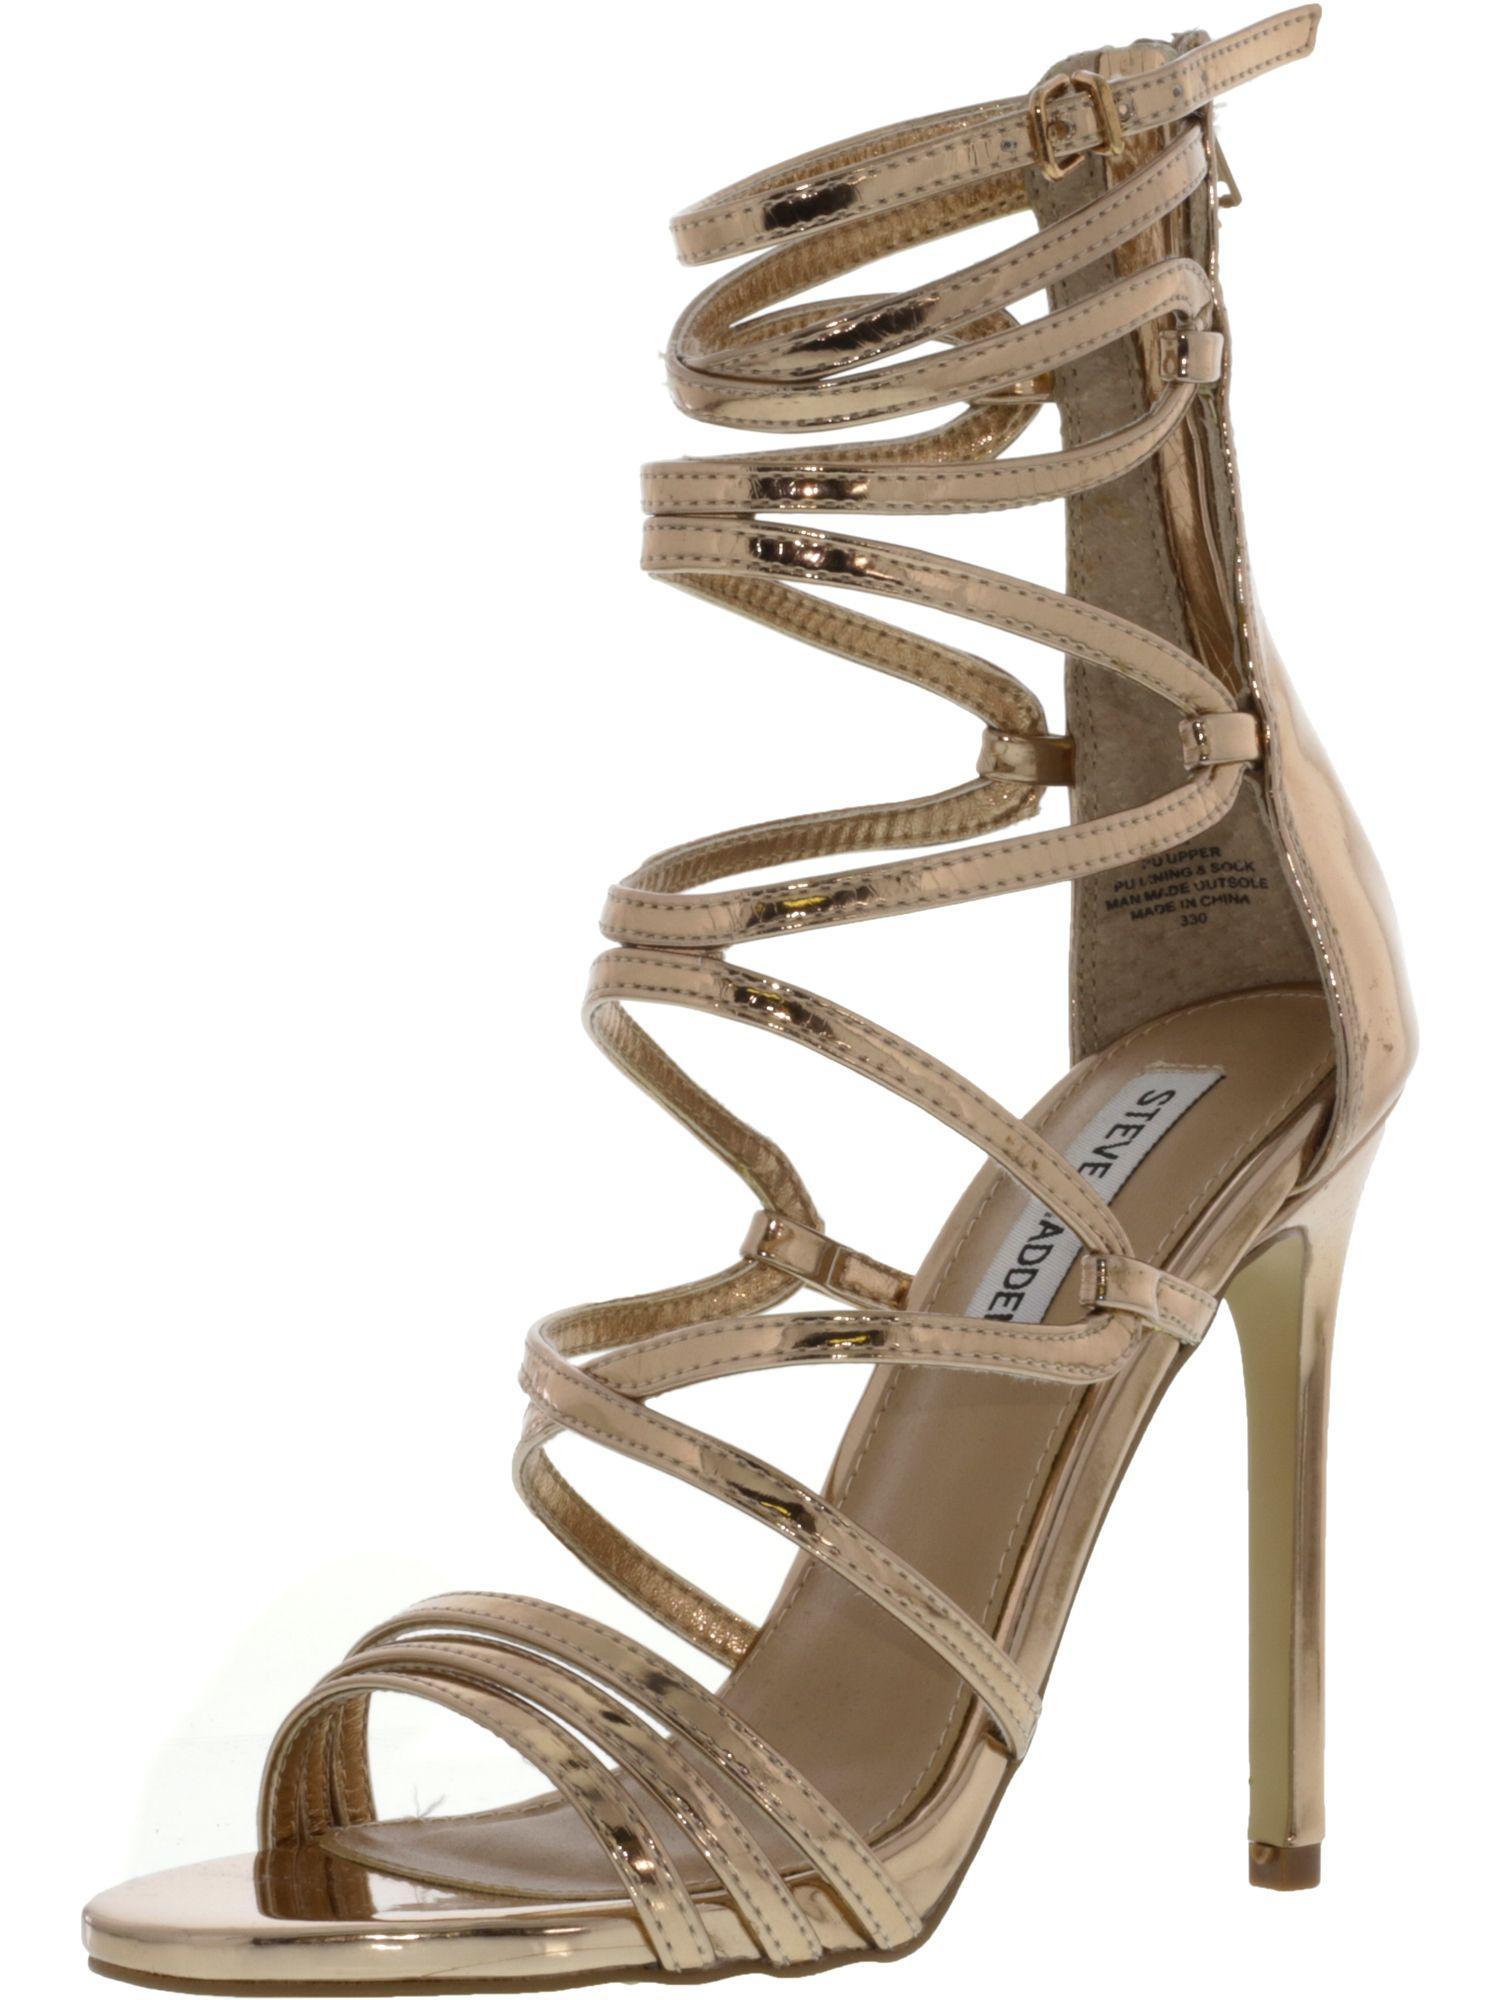 9e17ce6e9c9 Lyst - Steve Madden Women s Flaunt Dark Blush Patent Ankle-high Pump ...